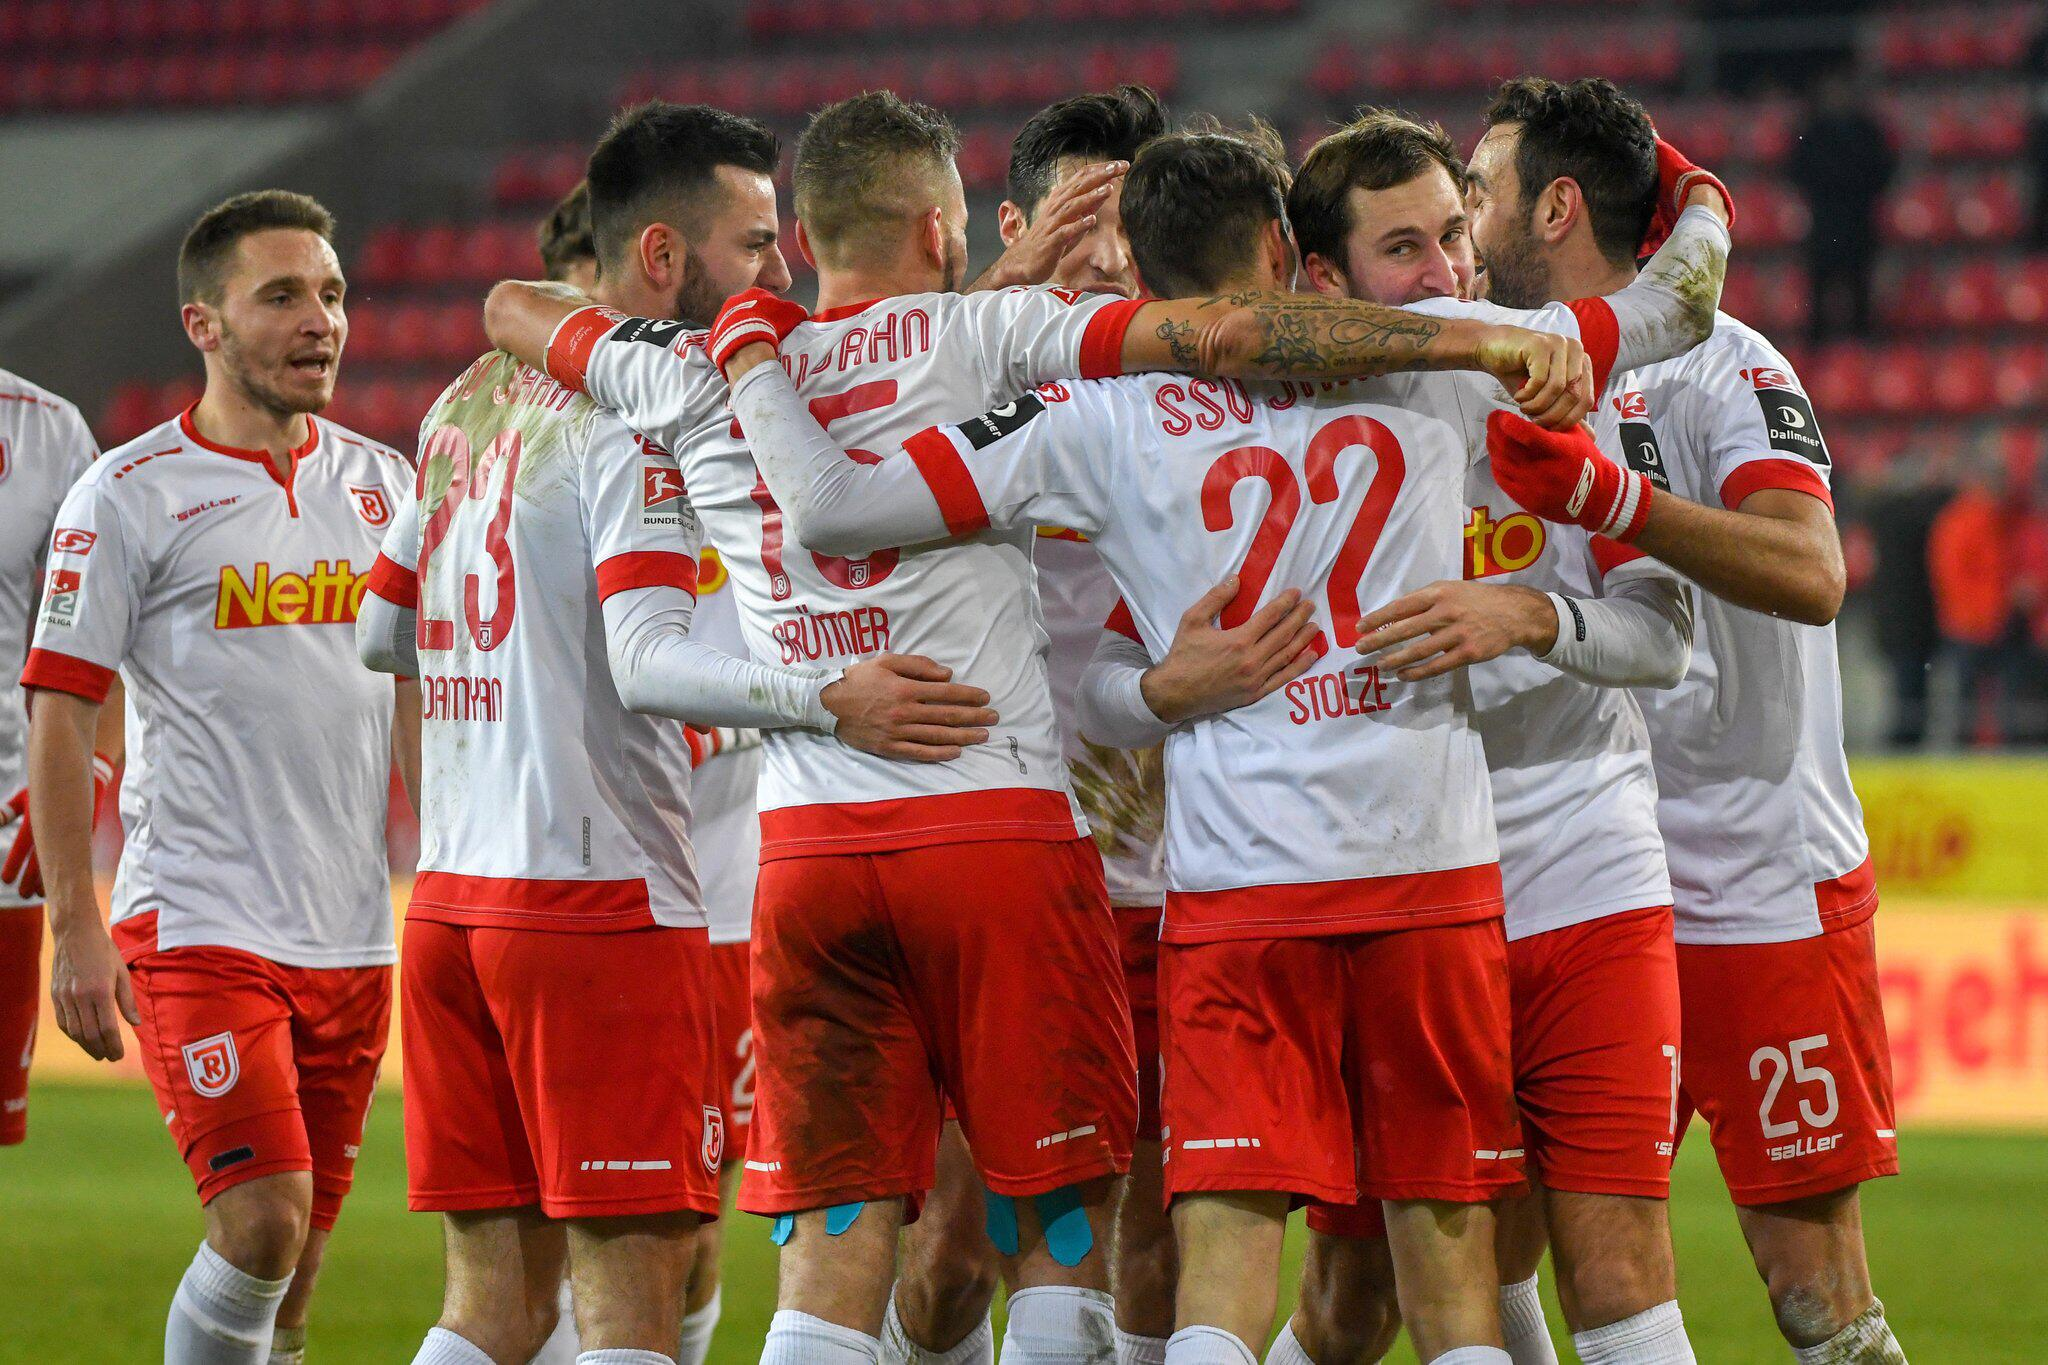 Bild zu Jahn Regensburg - SC Paderborn 07